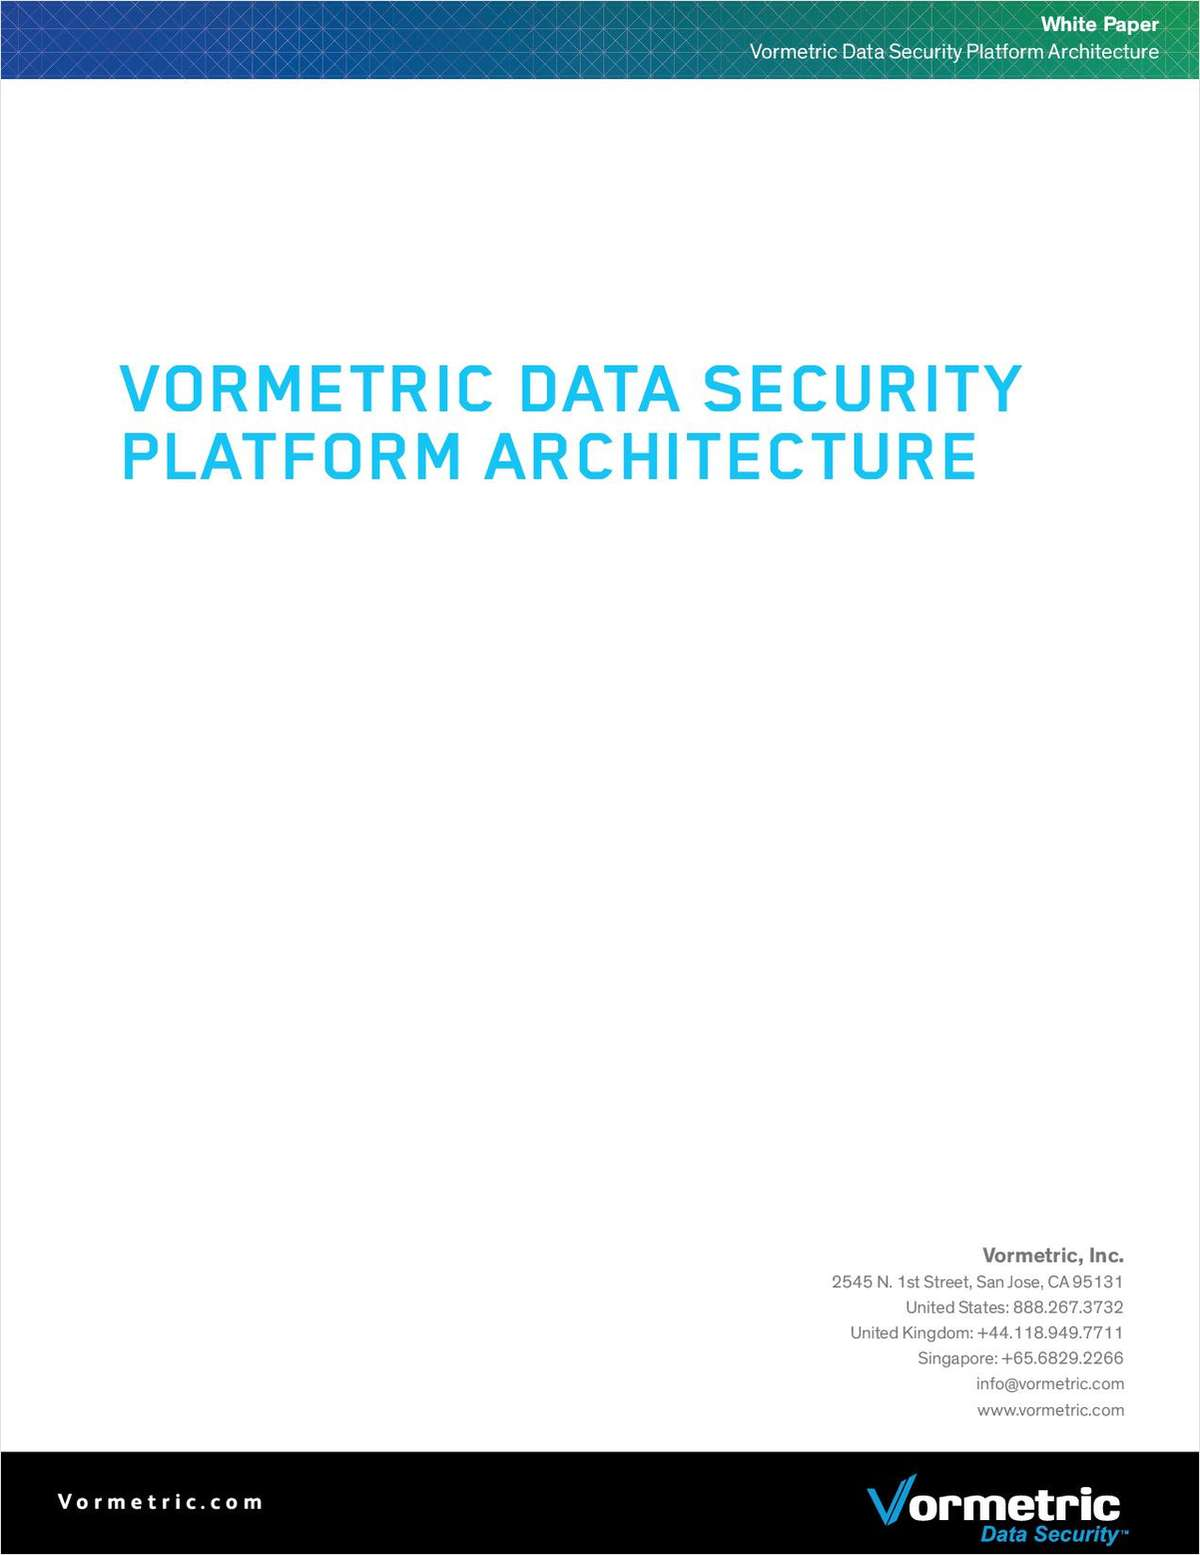 Vormetric Data Security Platform Architecture